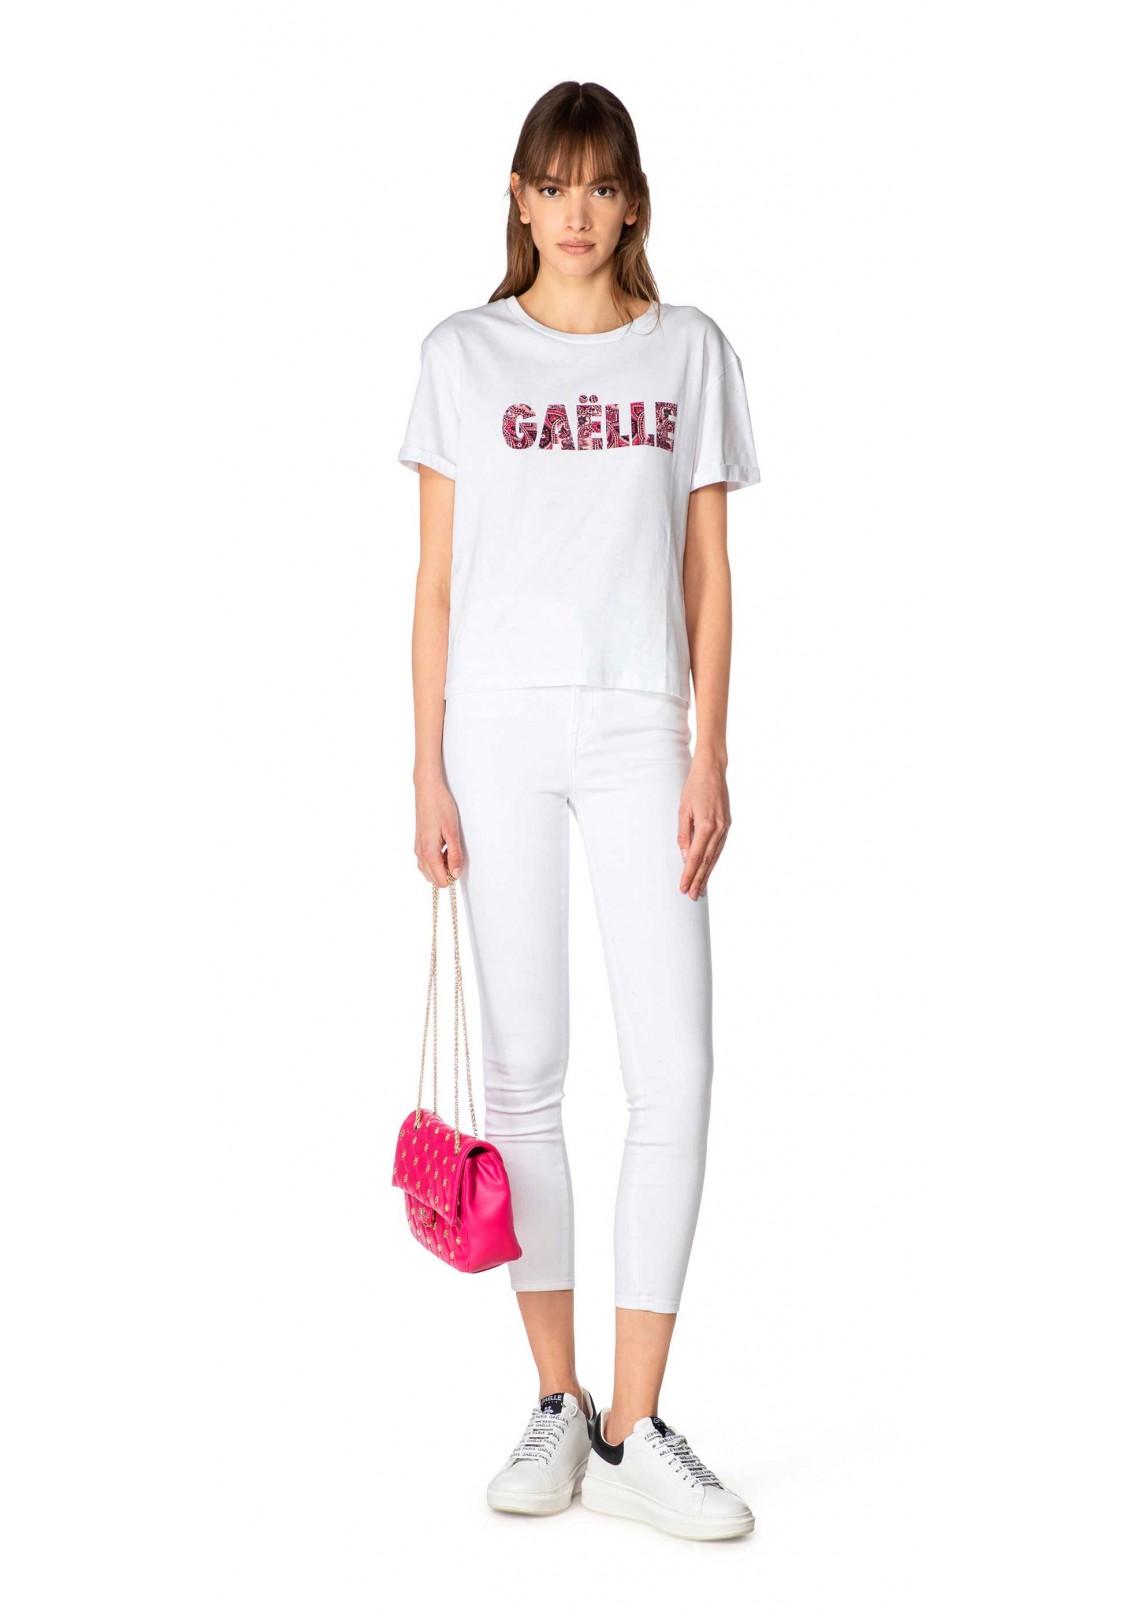 Gaelle T-shirt Donna Bianco Gaelle   GBD8873BIANCO